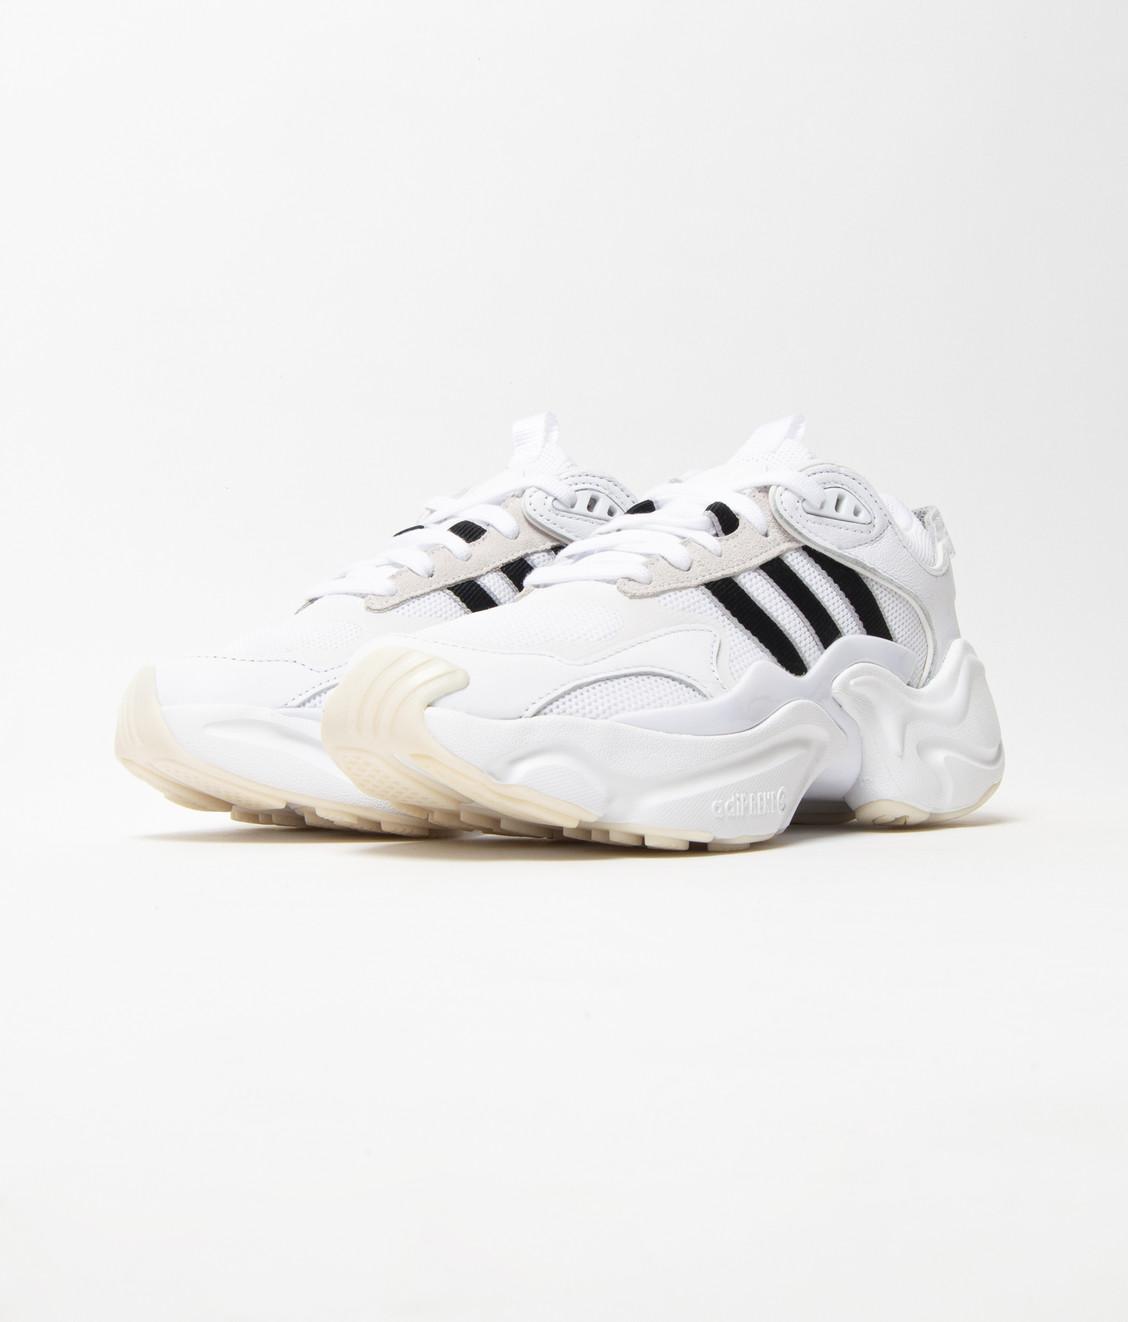 Adidas Adidas Magmur Runner White Black